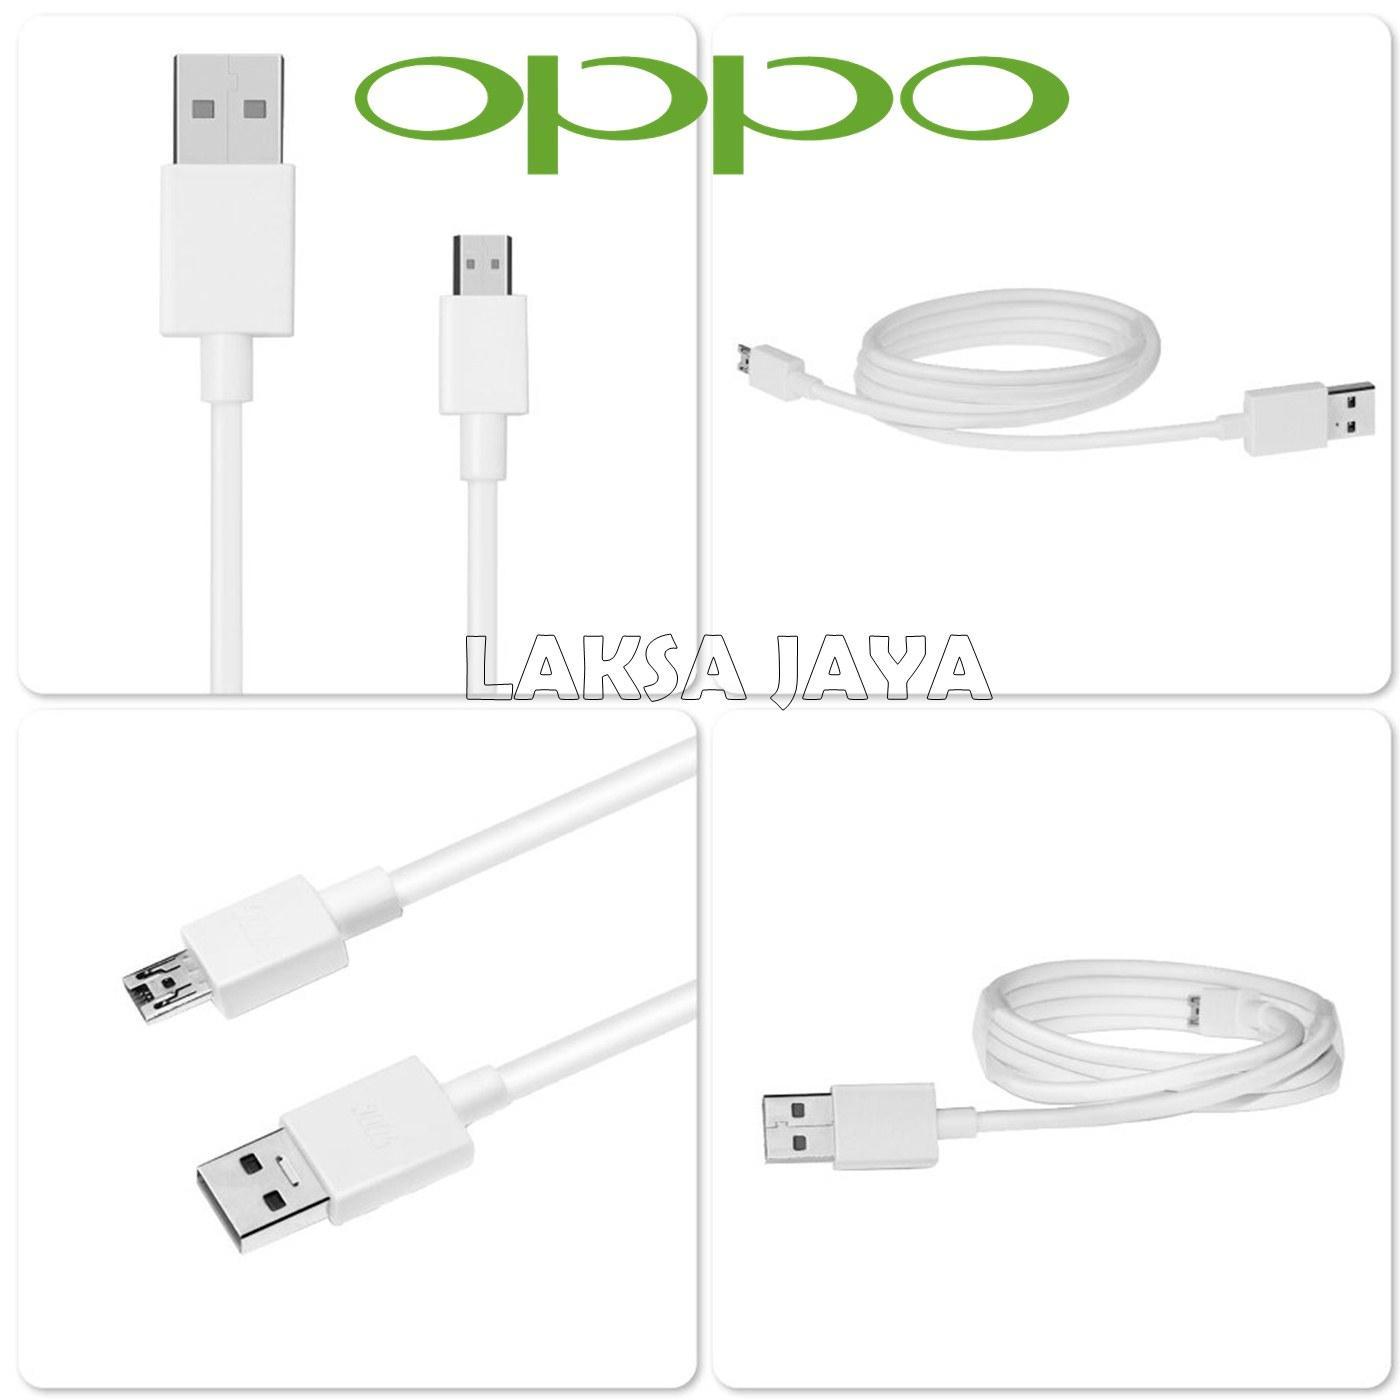 Oppo Kabel Data Micro USB 2A Fast Charging Dan Sync Transfer Data - Putih